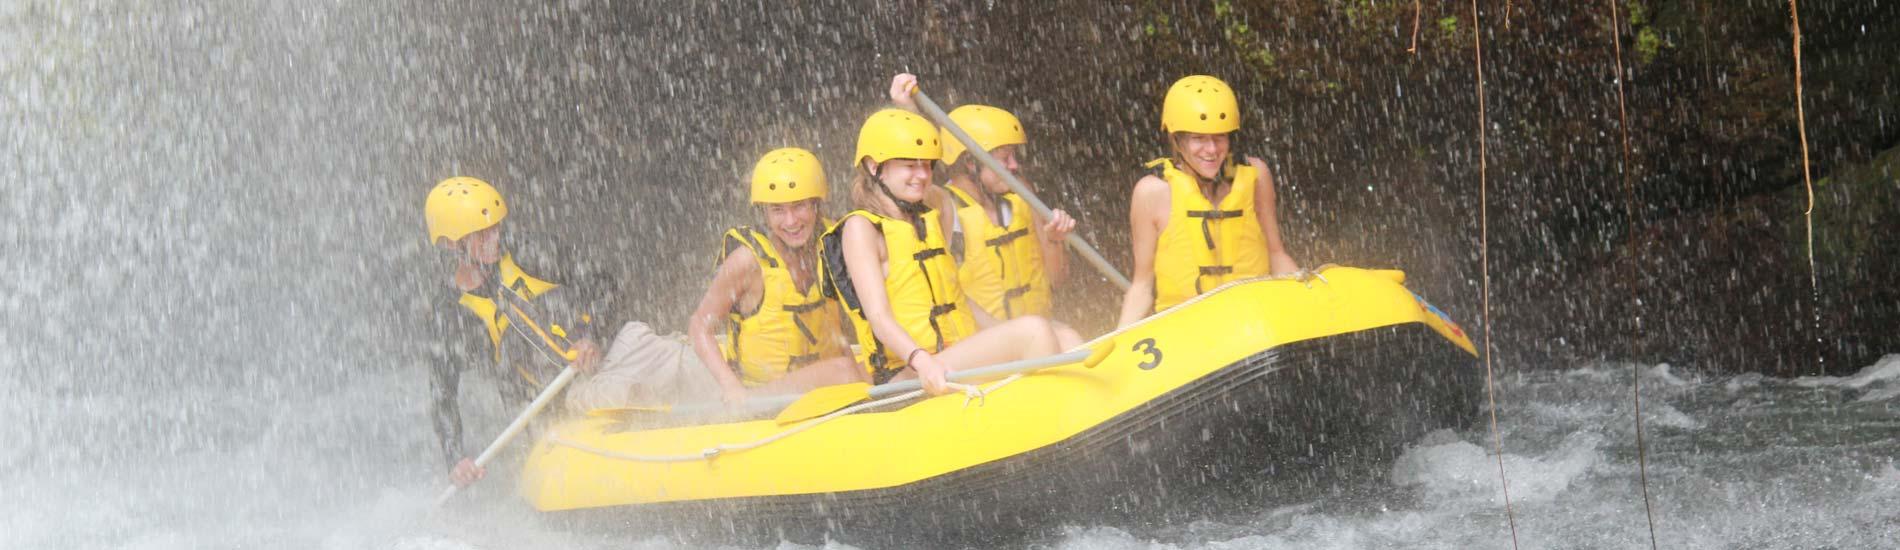 Telaga Waja White Water Rafting Bali